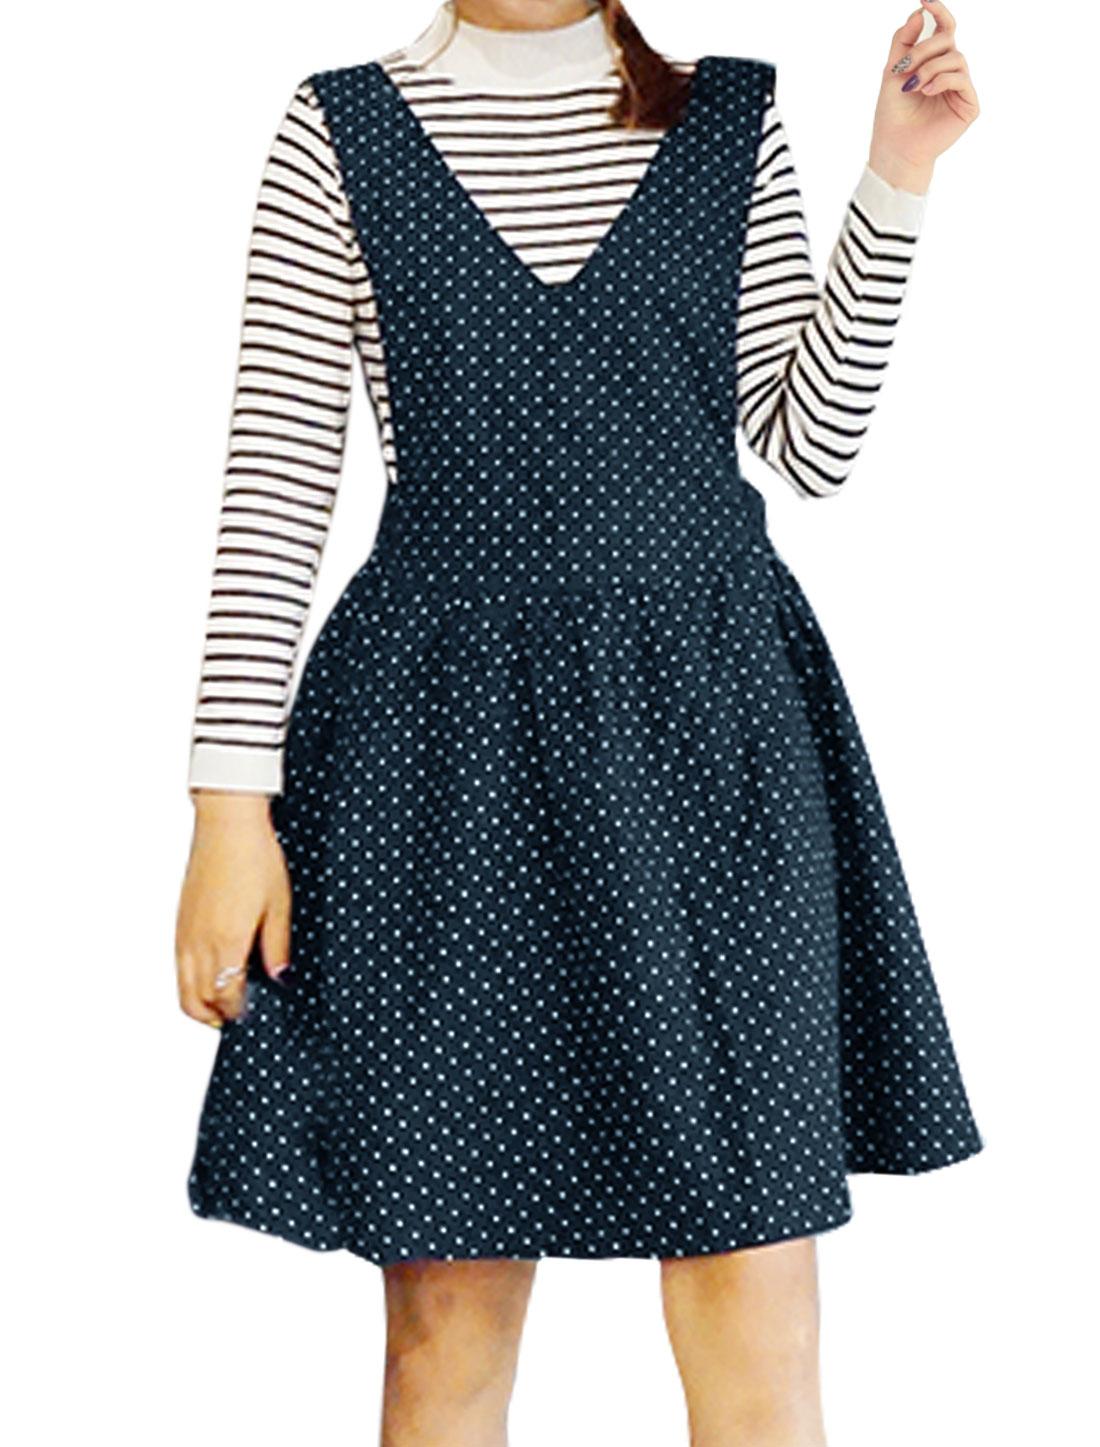 Women V Neckline Polka Dots Fit and Flare Jumper Dress Blue XS